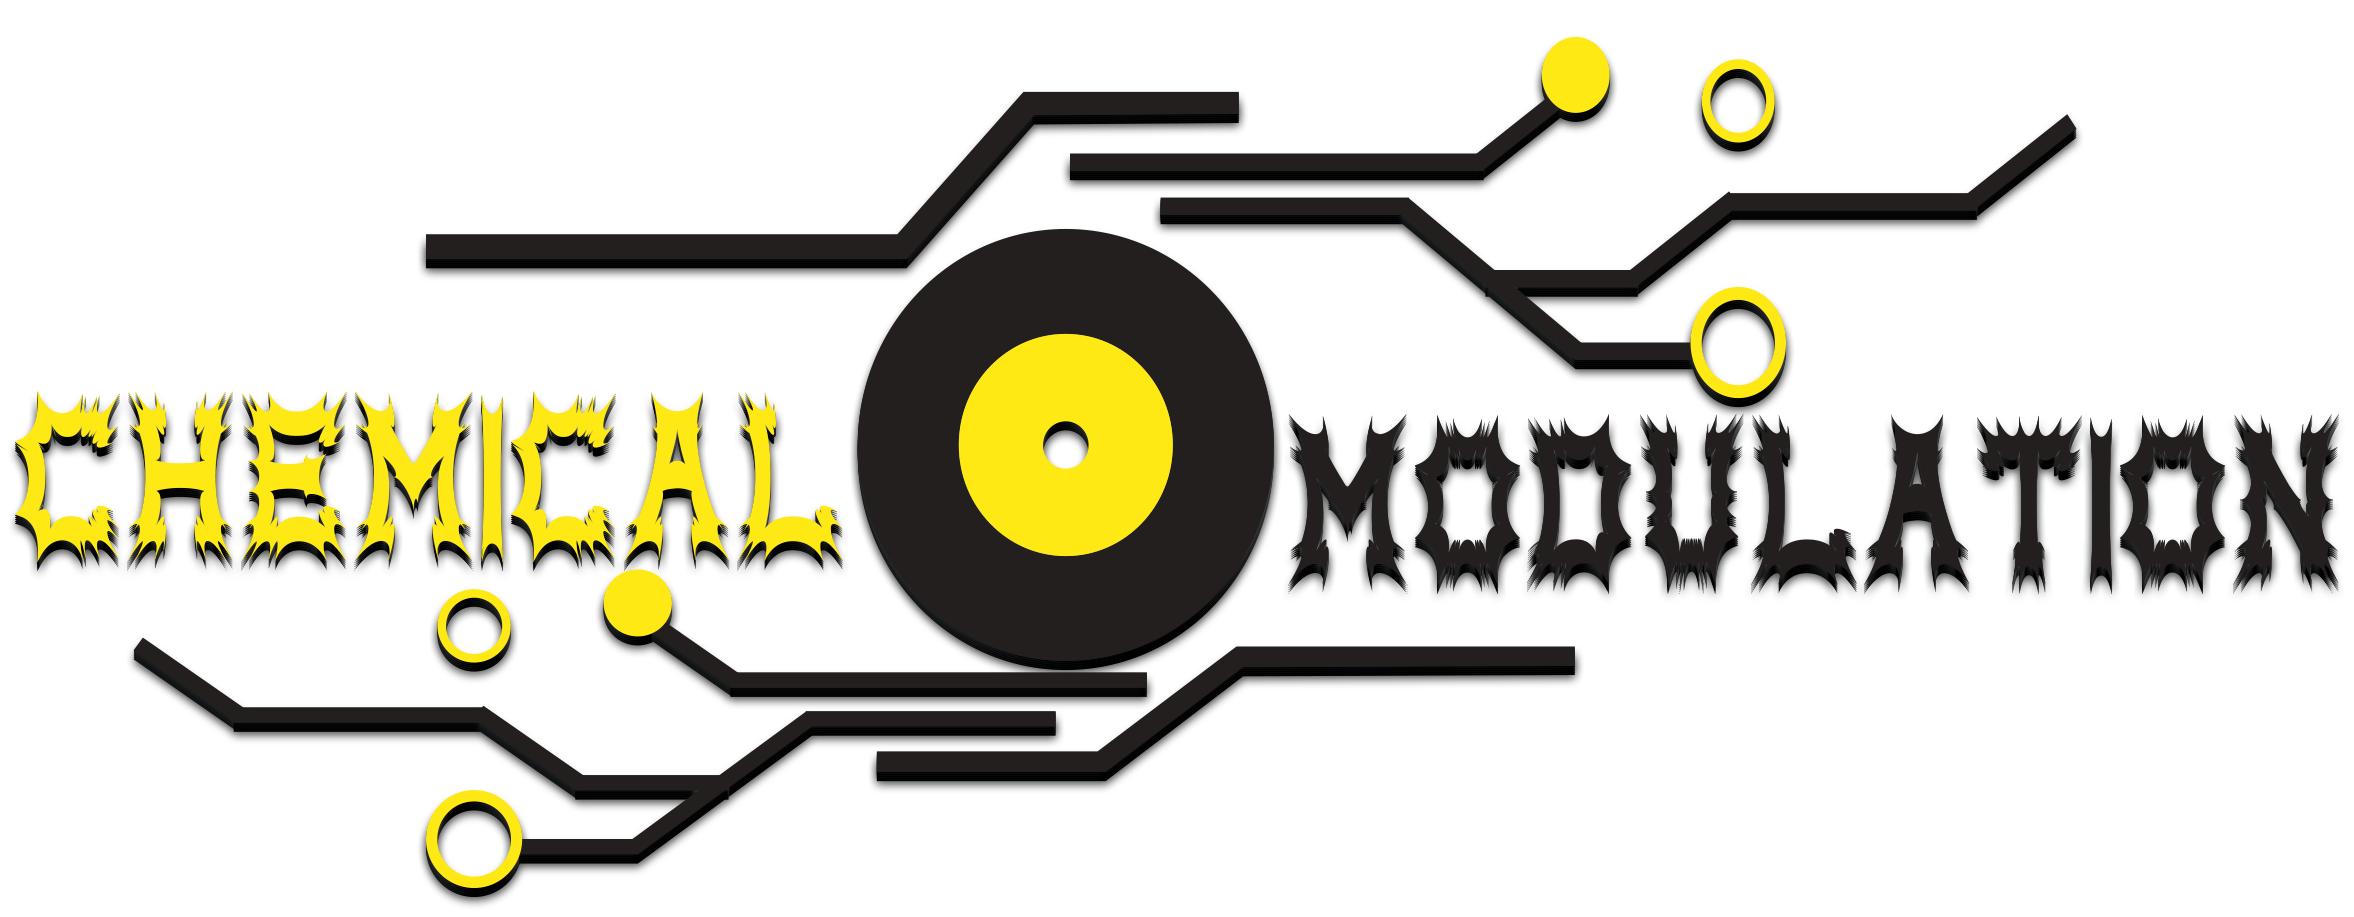 Chemical Modulation